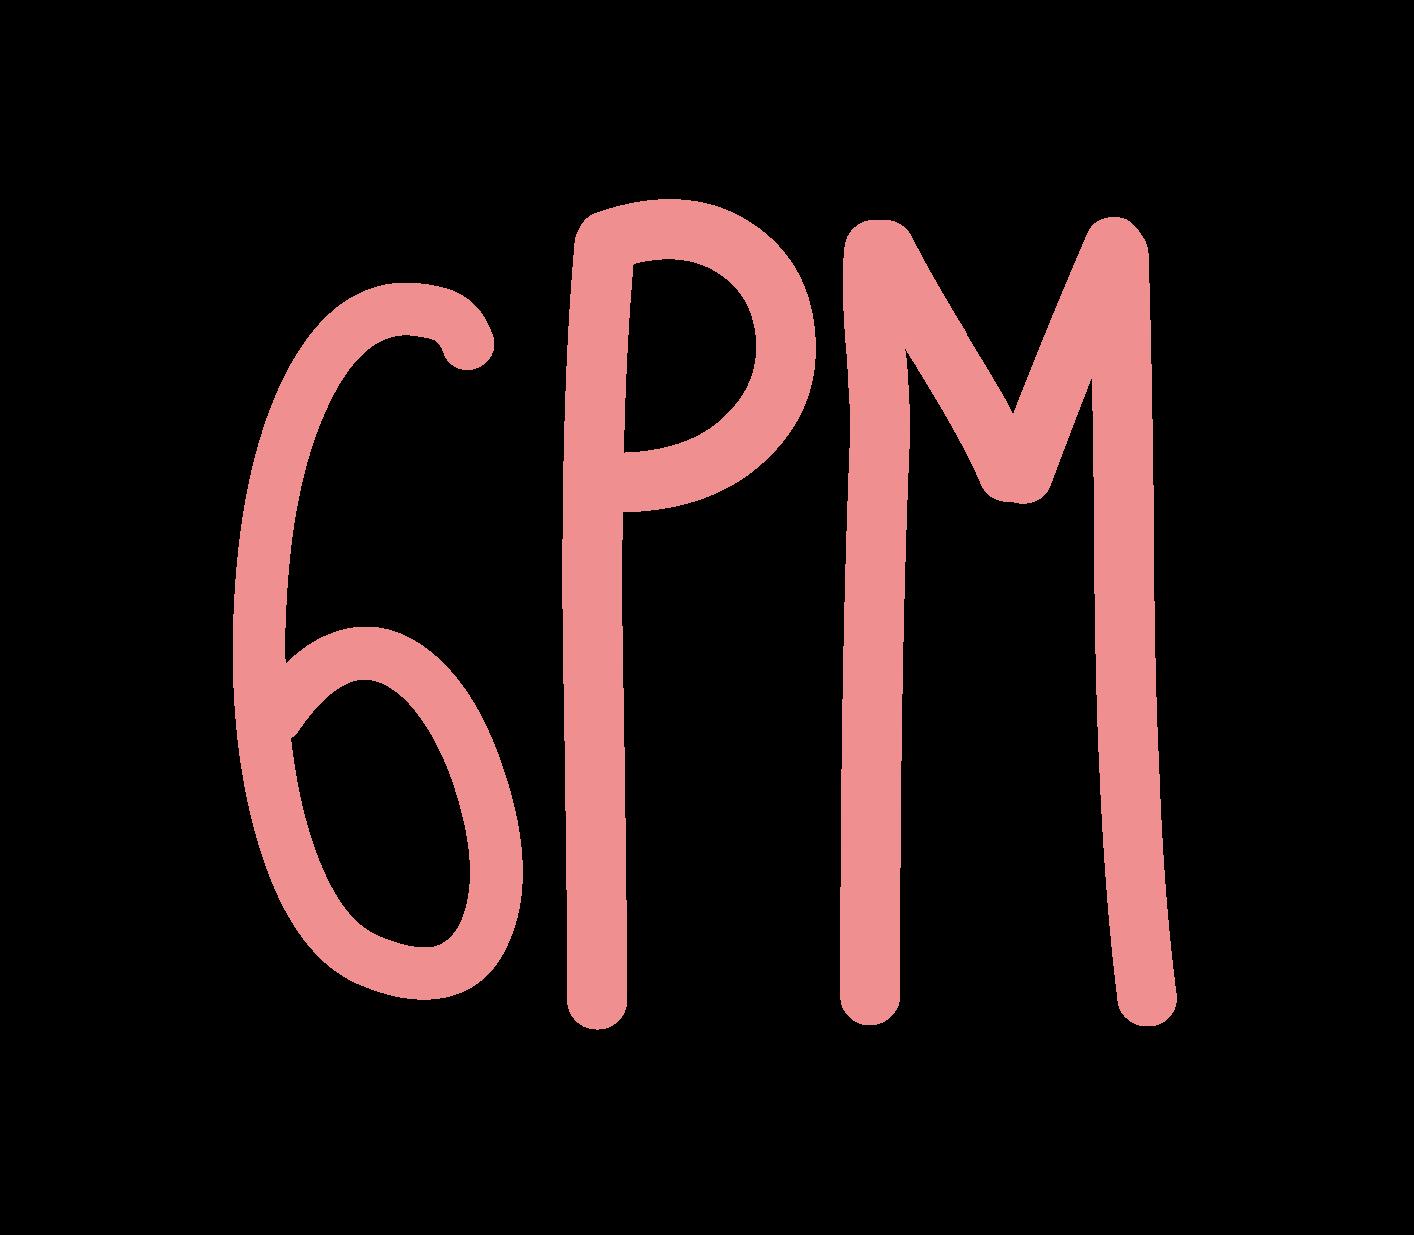 handwritten font 6pm the pink sushi